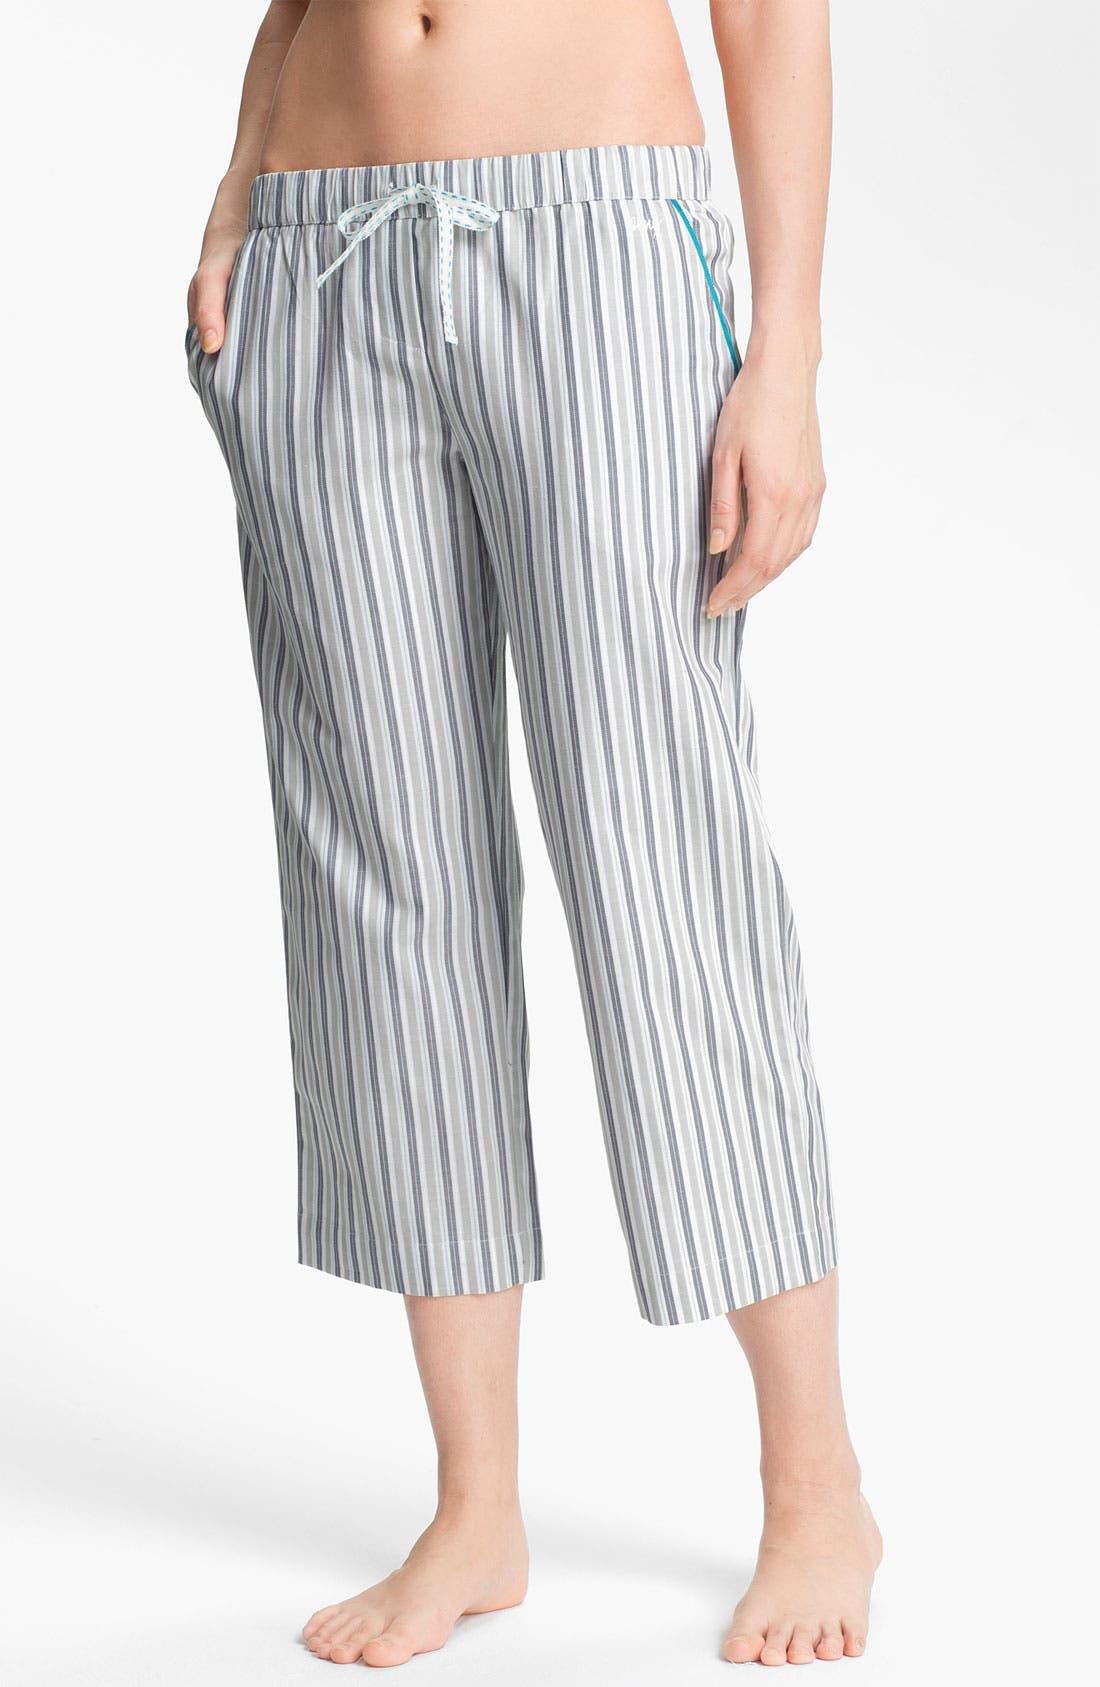 Main Image - DKNY 'Sugar Rush' Capri Pants